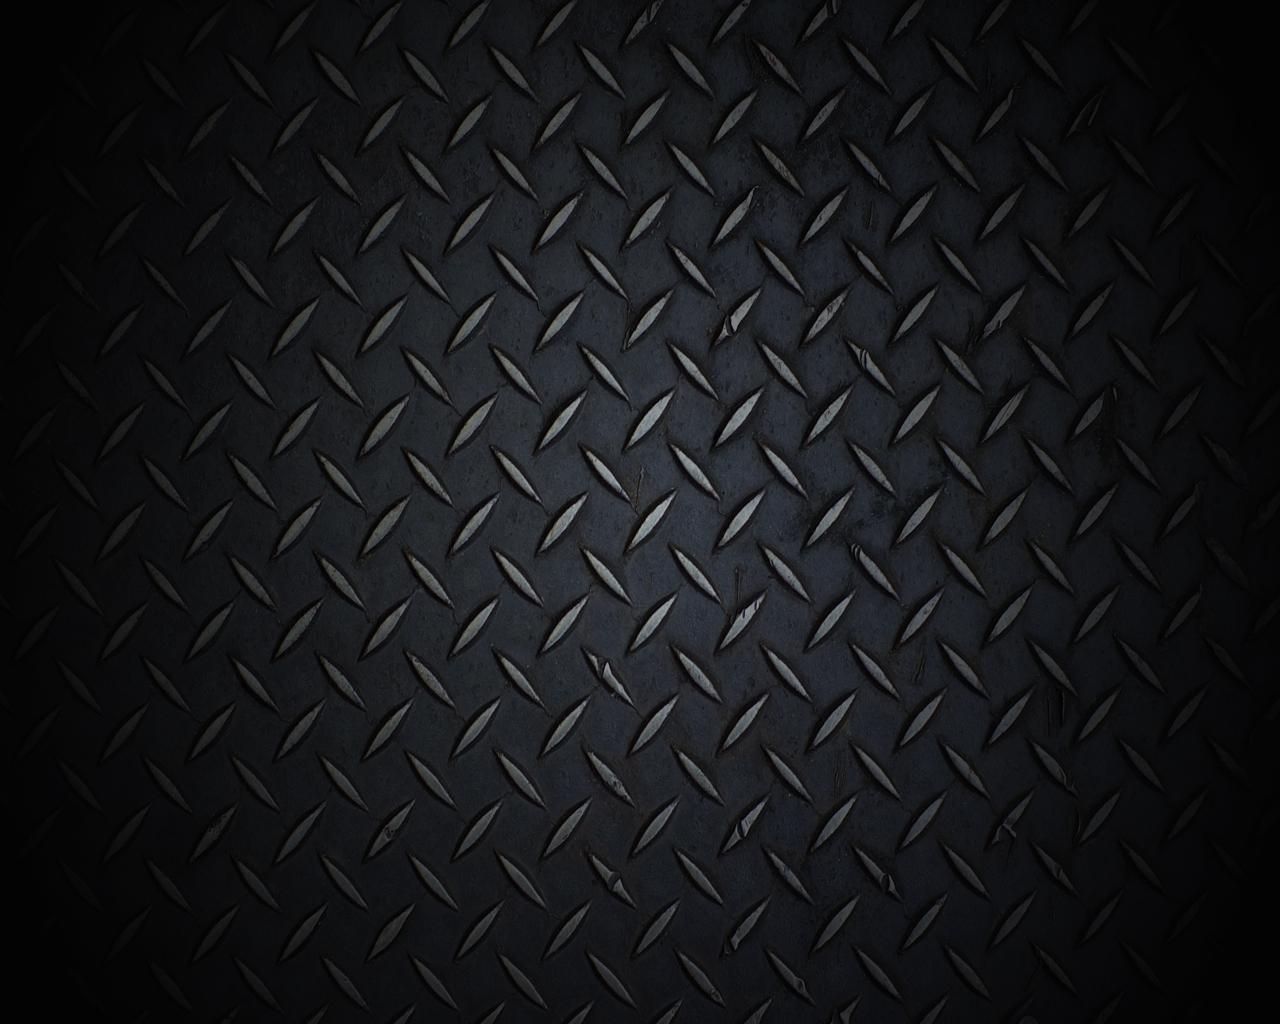 Diamond Plate PNG HD - 126905